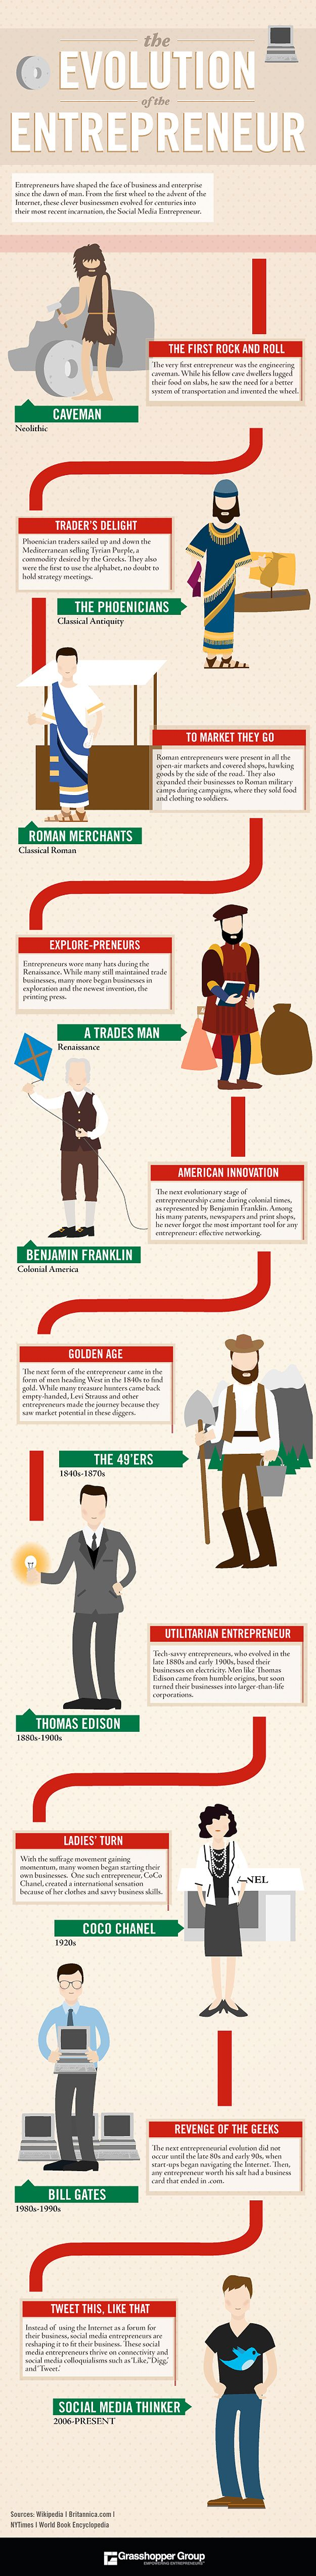 Evolution of the Entrepreneur , from cavemen to social media thinkers!